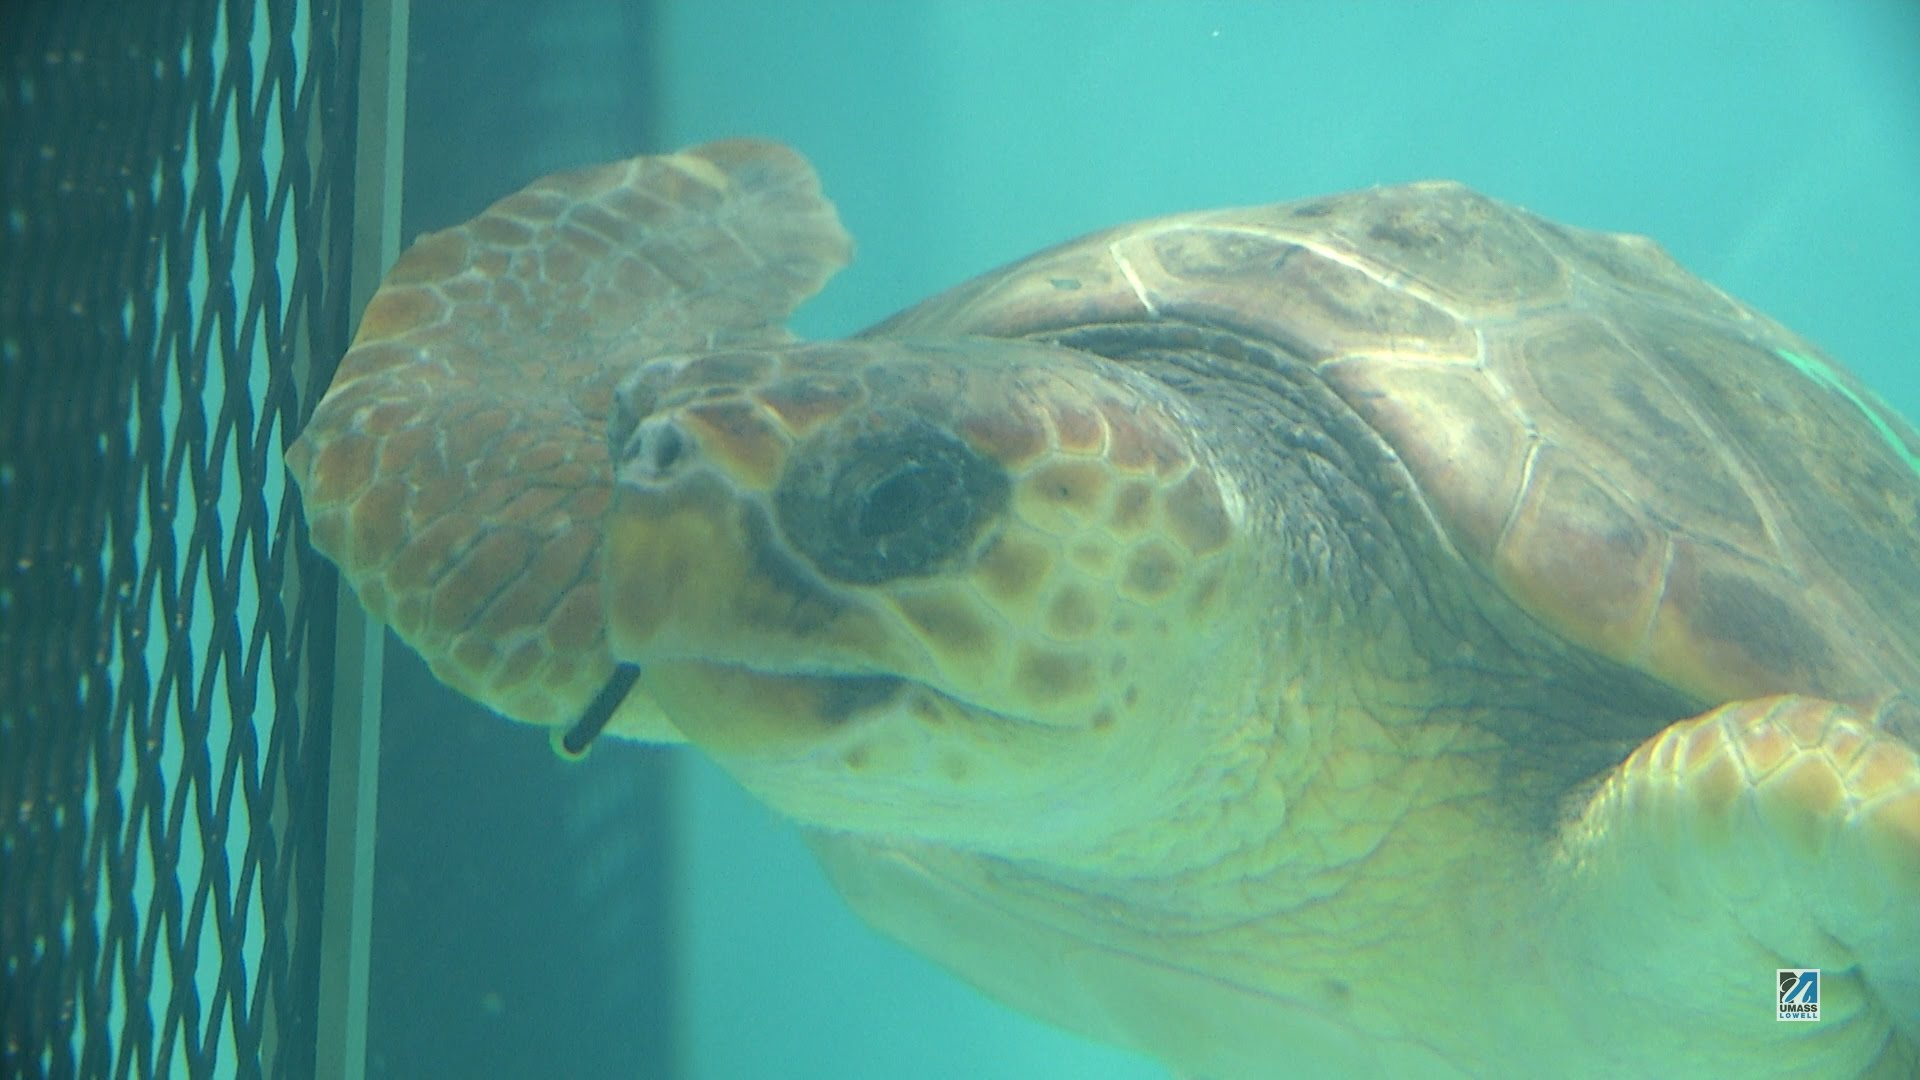 Endangered Kemp's ridley sea turtles (1080p 60fps) - YouTube